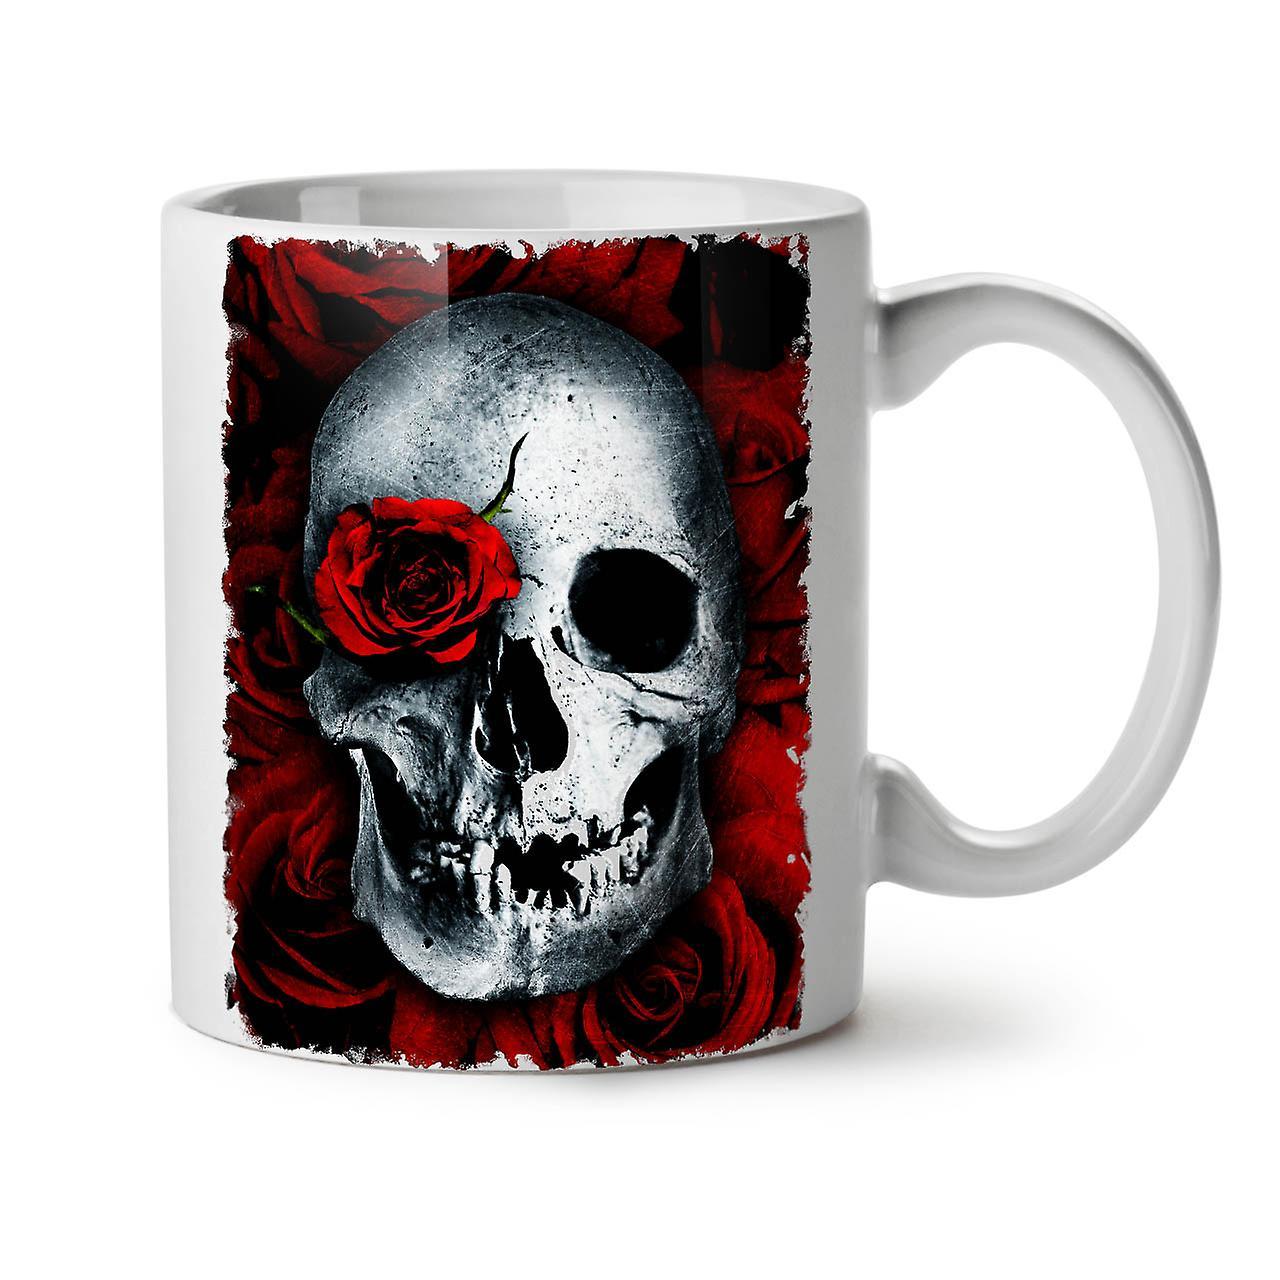 Thé Café Tasse Crânes Fleur OzWellcoda Nouveau Blanc Rose 11 Céramique tBrdxhCsQ